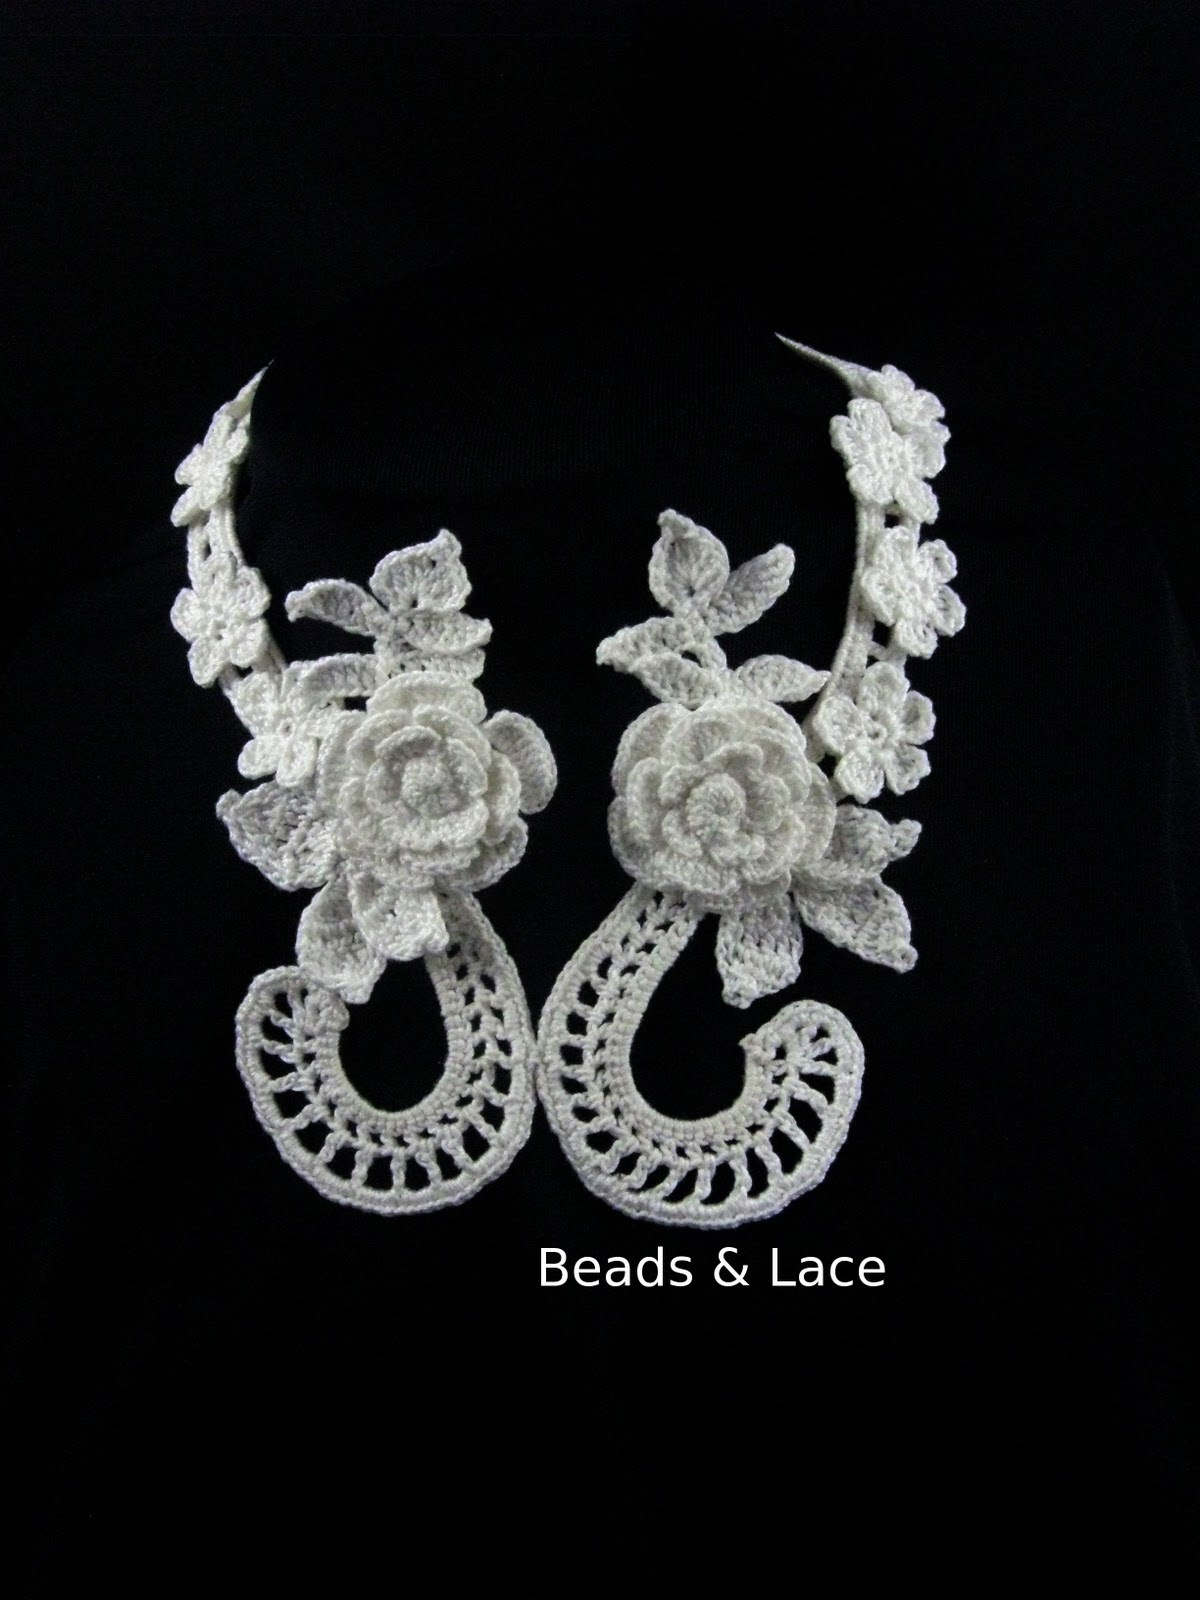 Beads lace irish crochet jewelery irish crochet jewelery bankloansurffo Gallery